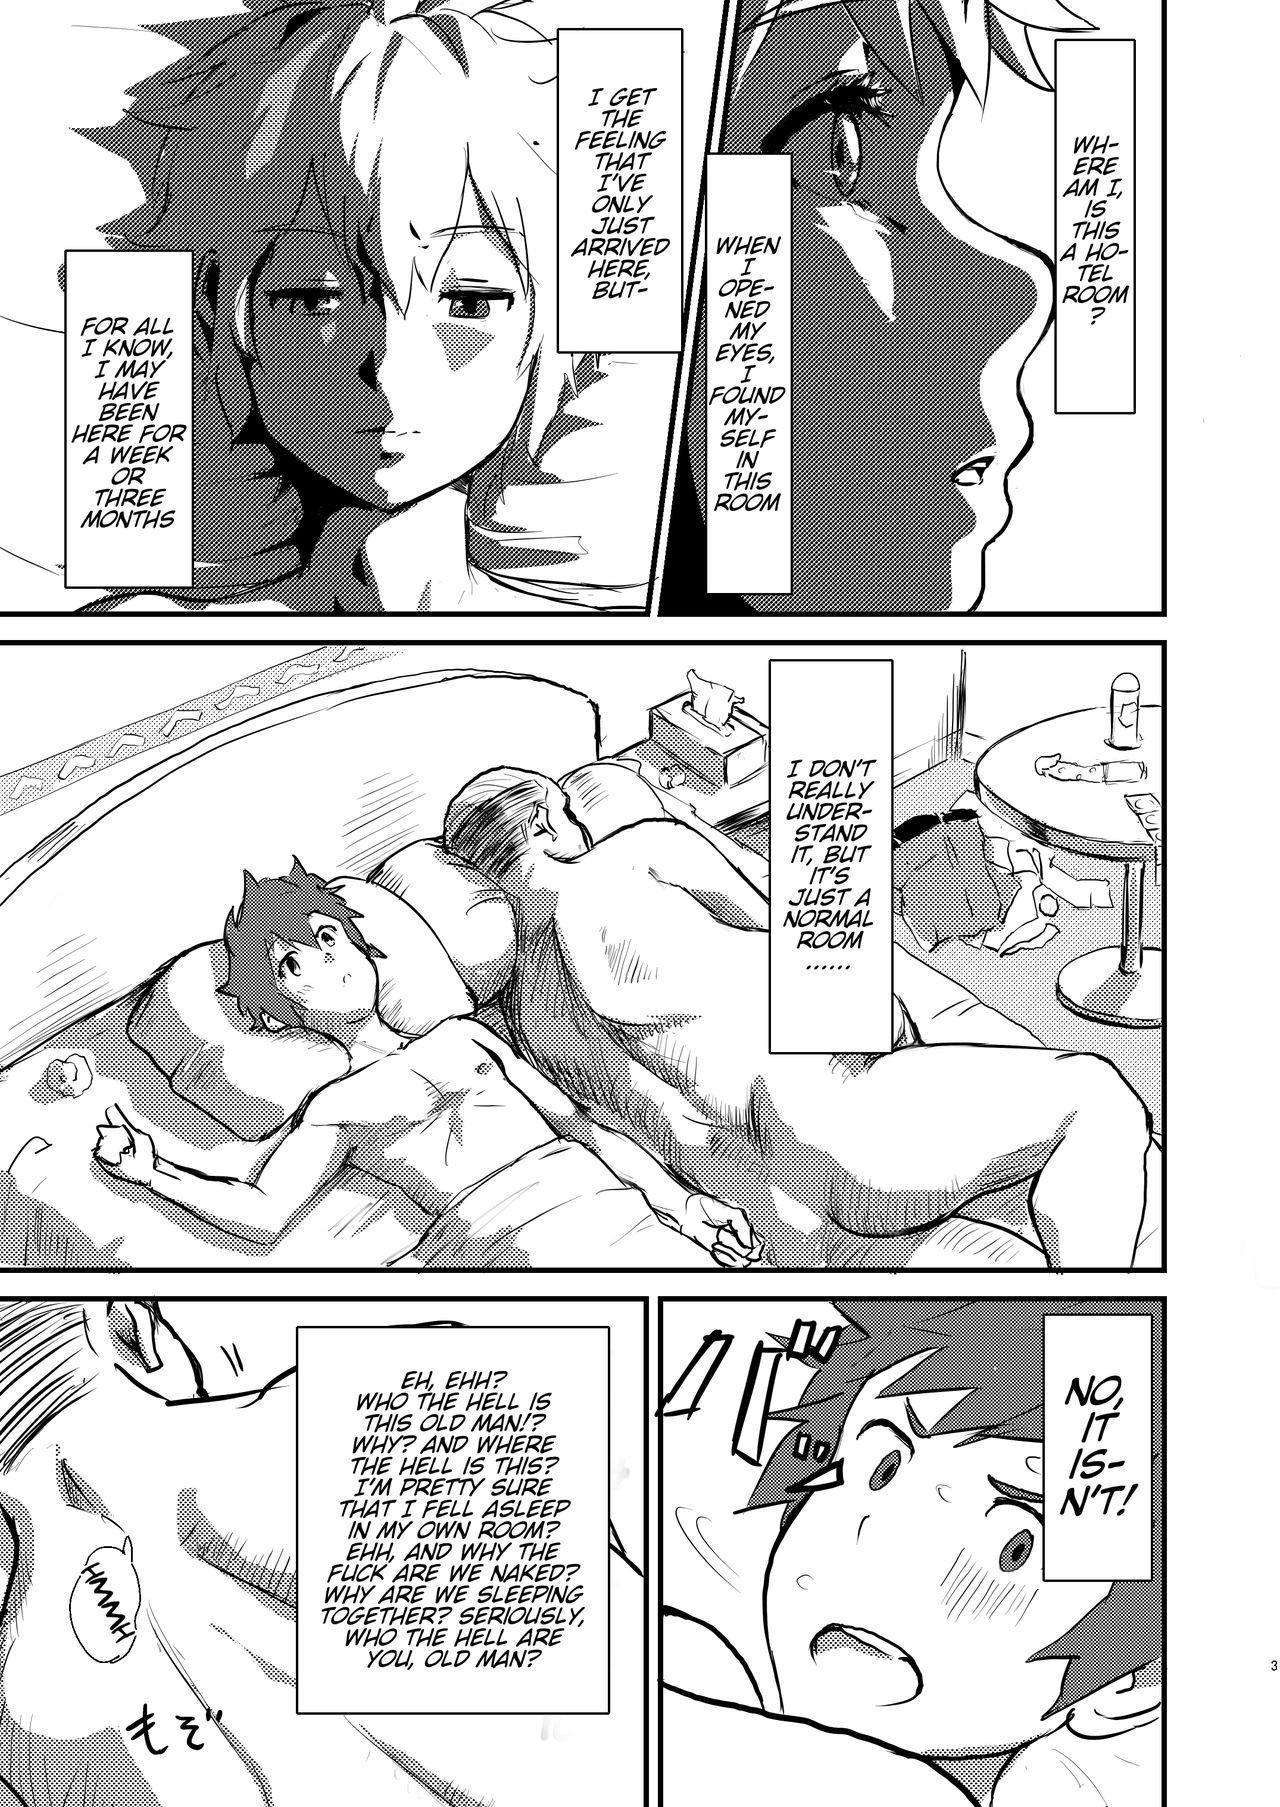 [Goma Brothers (Gomabura)] Taki no Ana. - sissy hole. Zenpen | Taki's Hole. - sissy hole. First Part (Kimi no Na wa.) [English] [alparslan] [Digital] 1